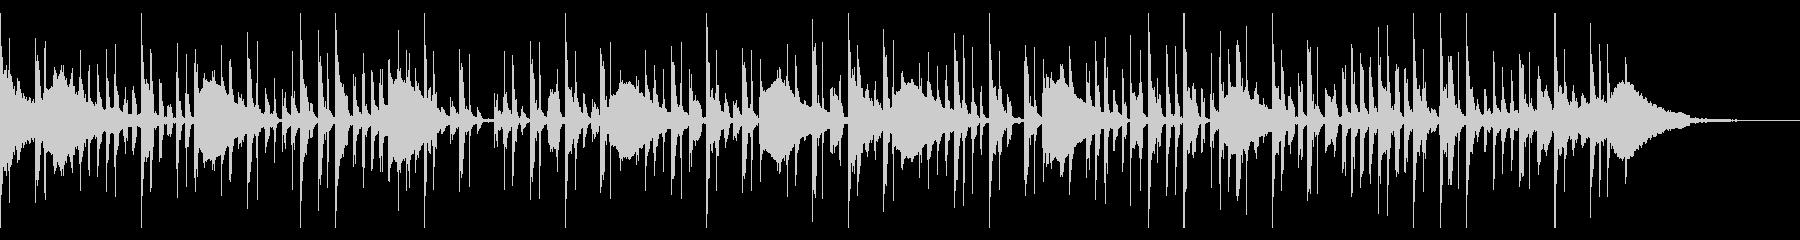 98 BPMの未再生の波形